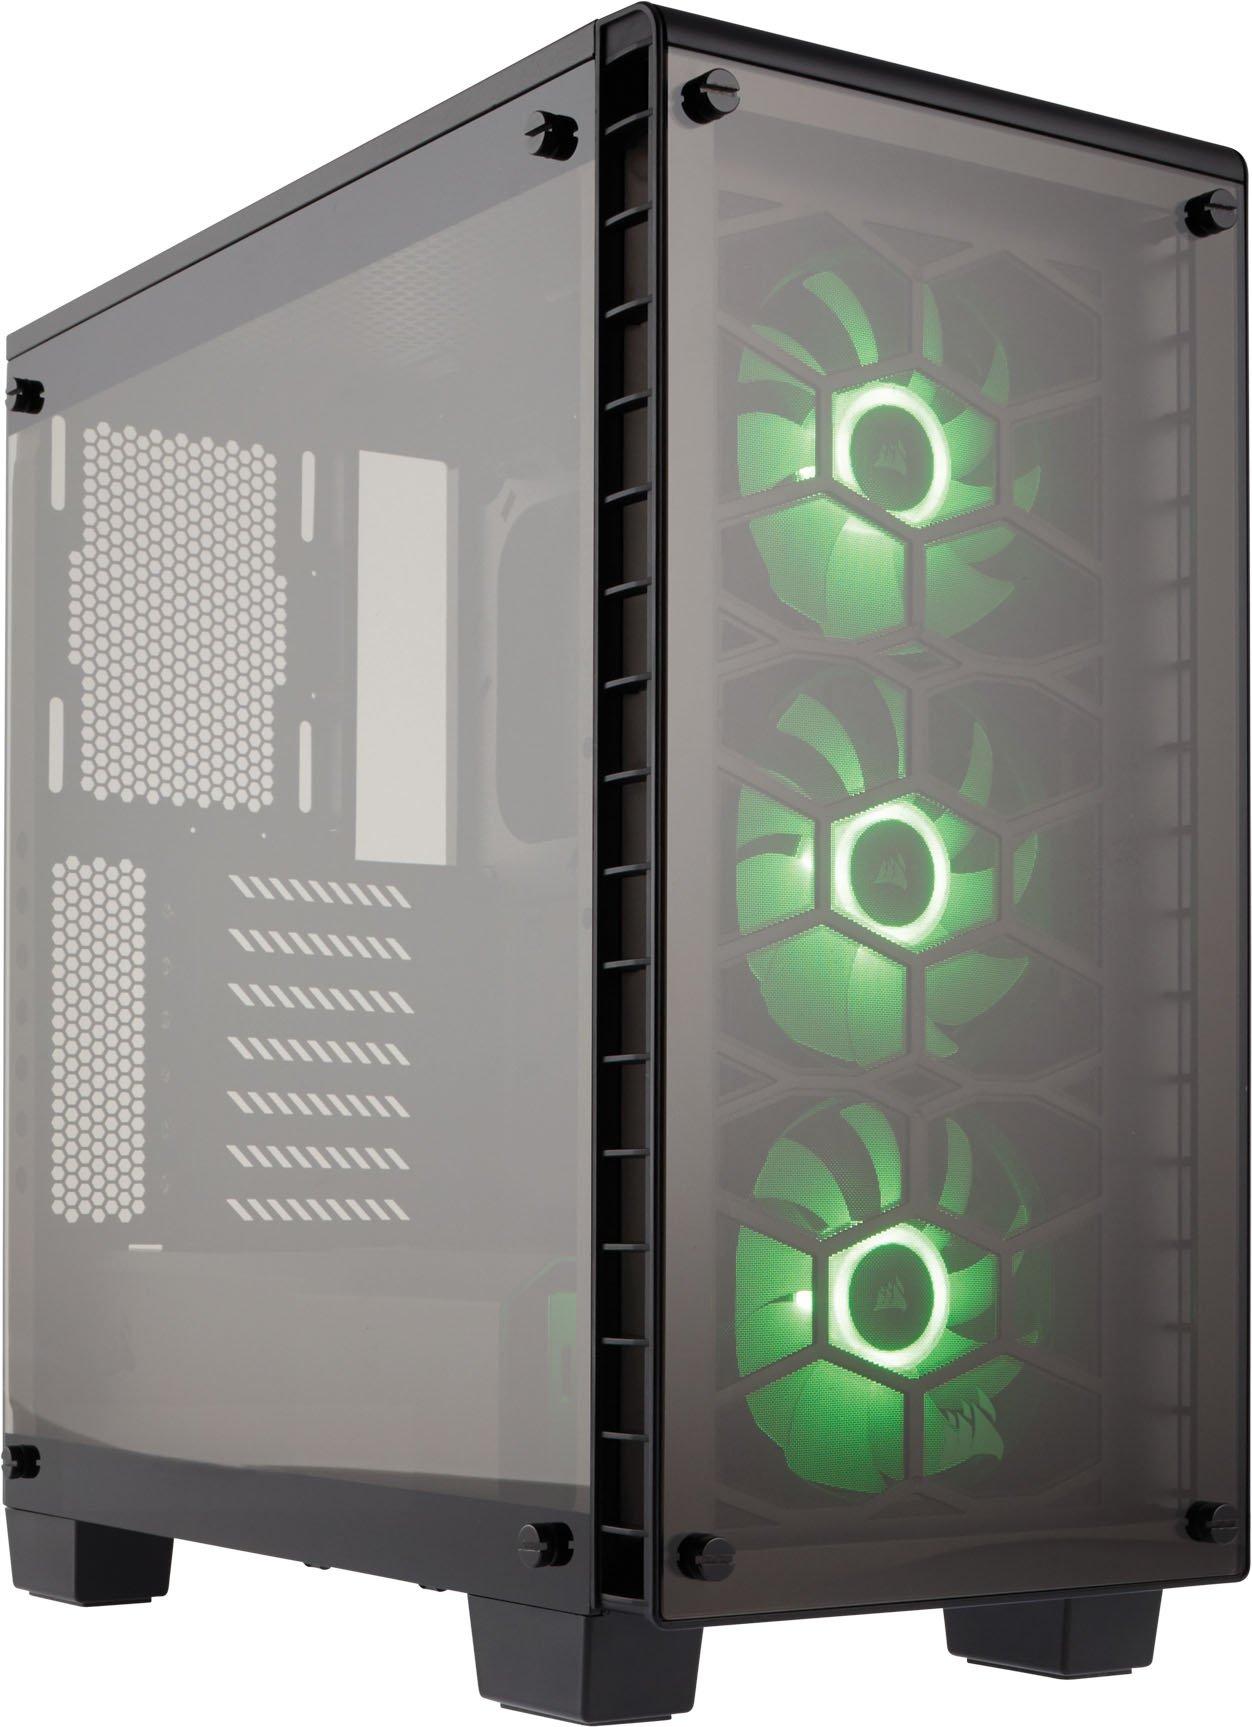 Corsair CC-9011101-WW Crystal Series 460X RGB, Tempered Glass, Compact ATX Mid by Corsair